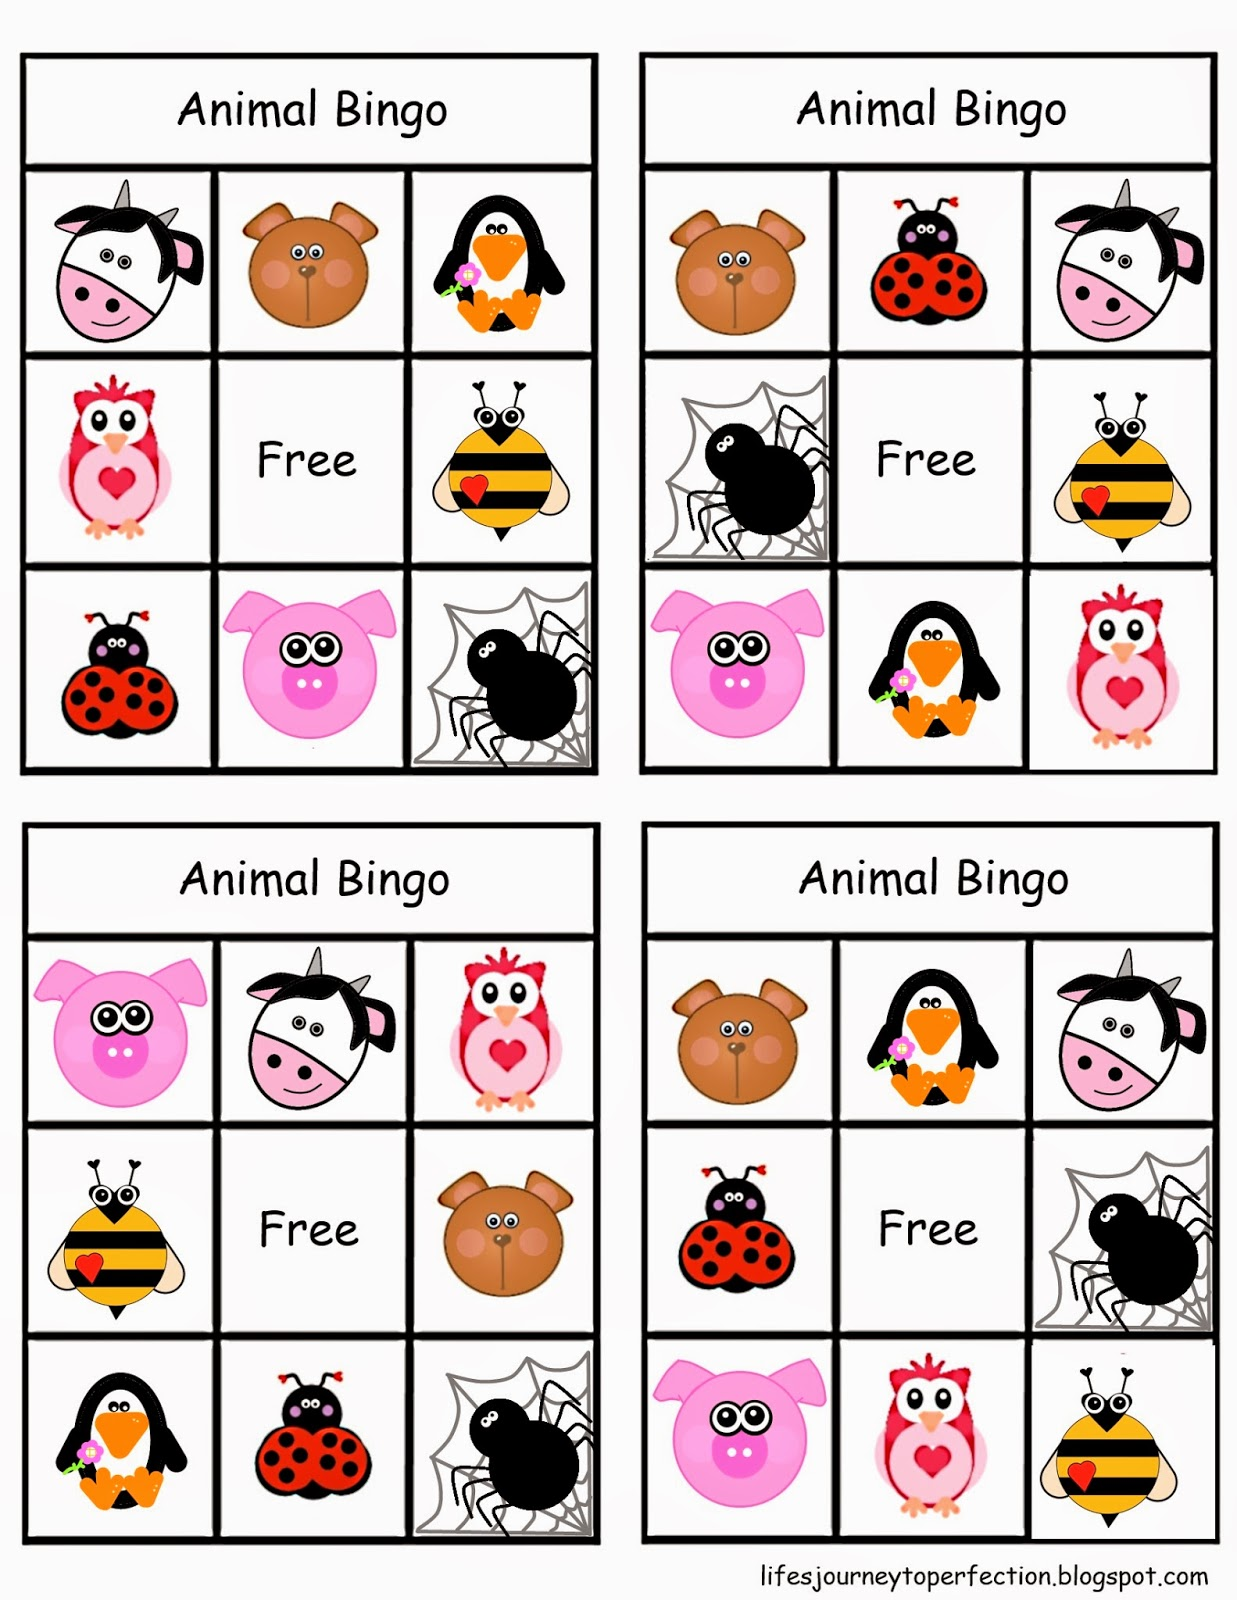 Sizzling image in animal bingo printable